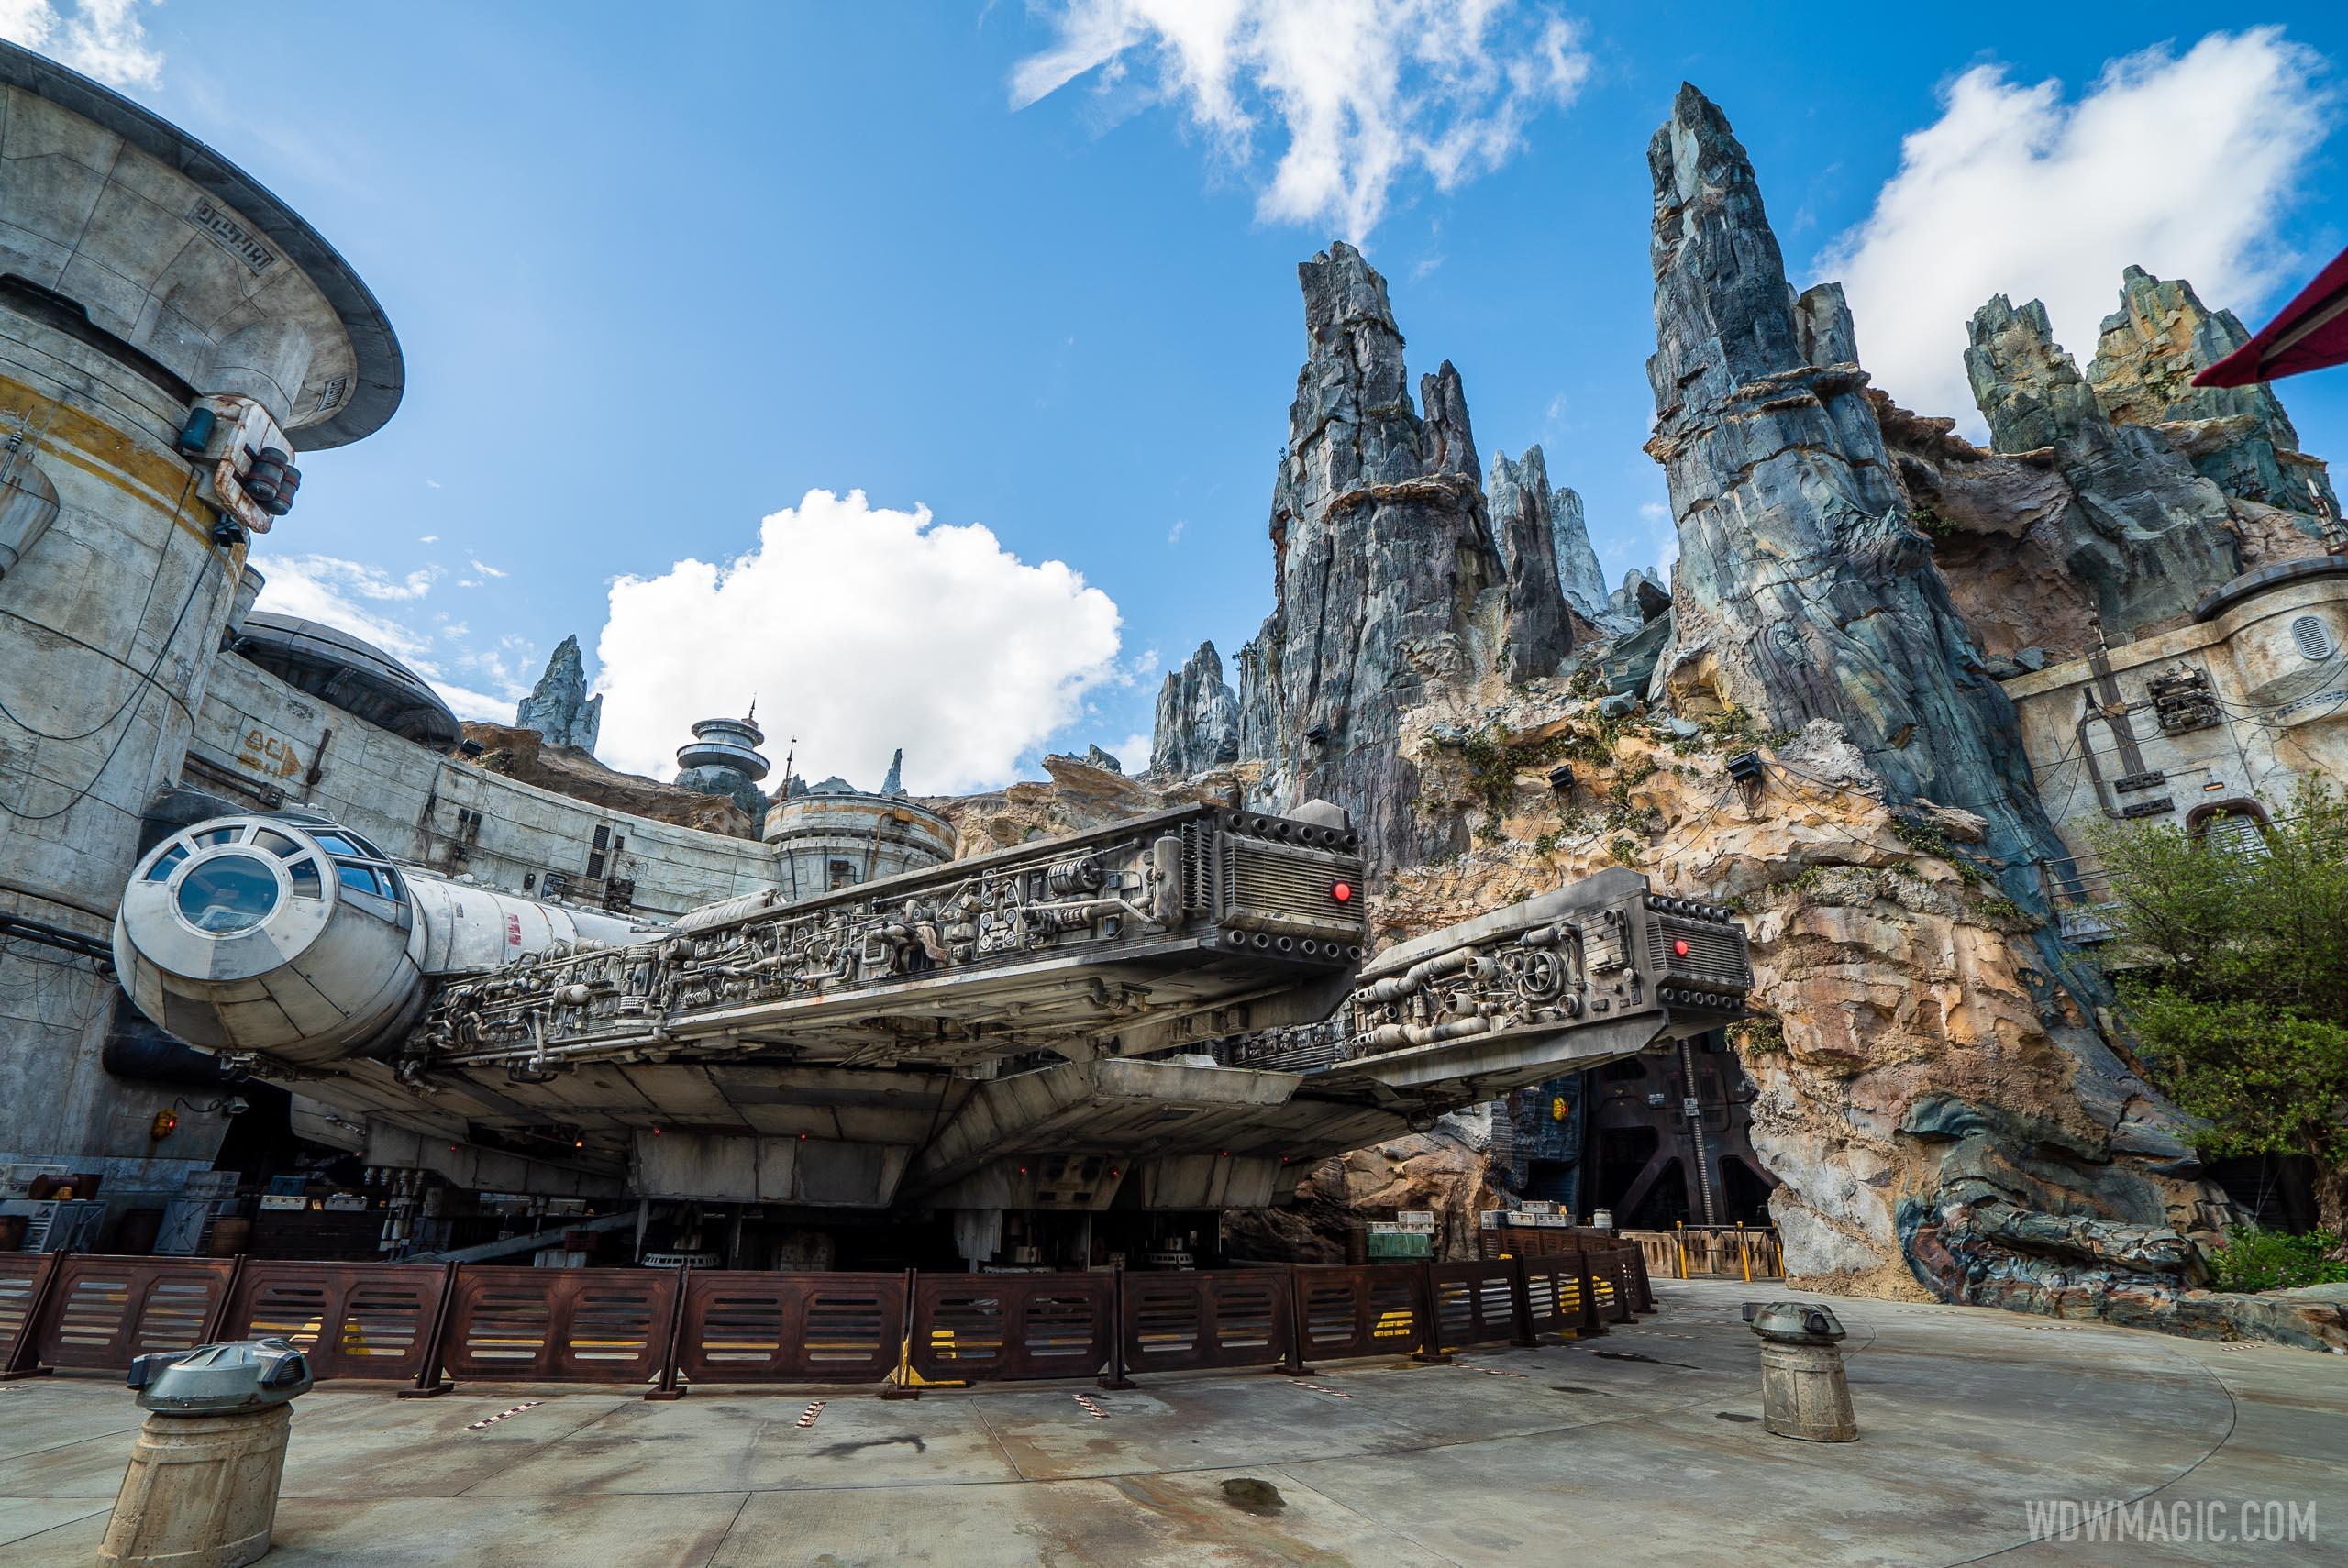 Star Wars Galaxy's Edge environment